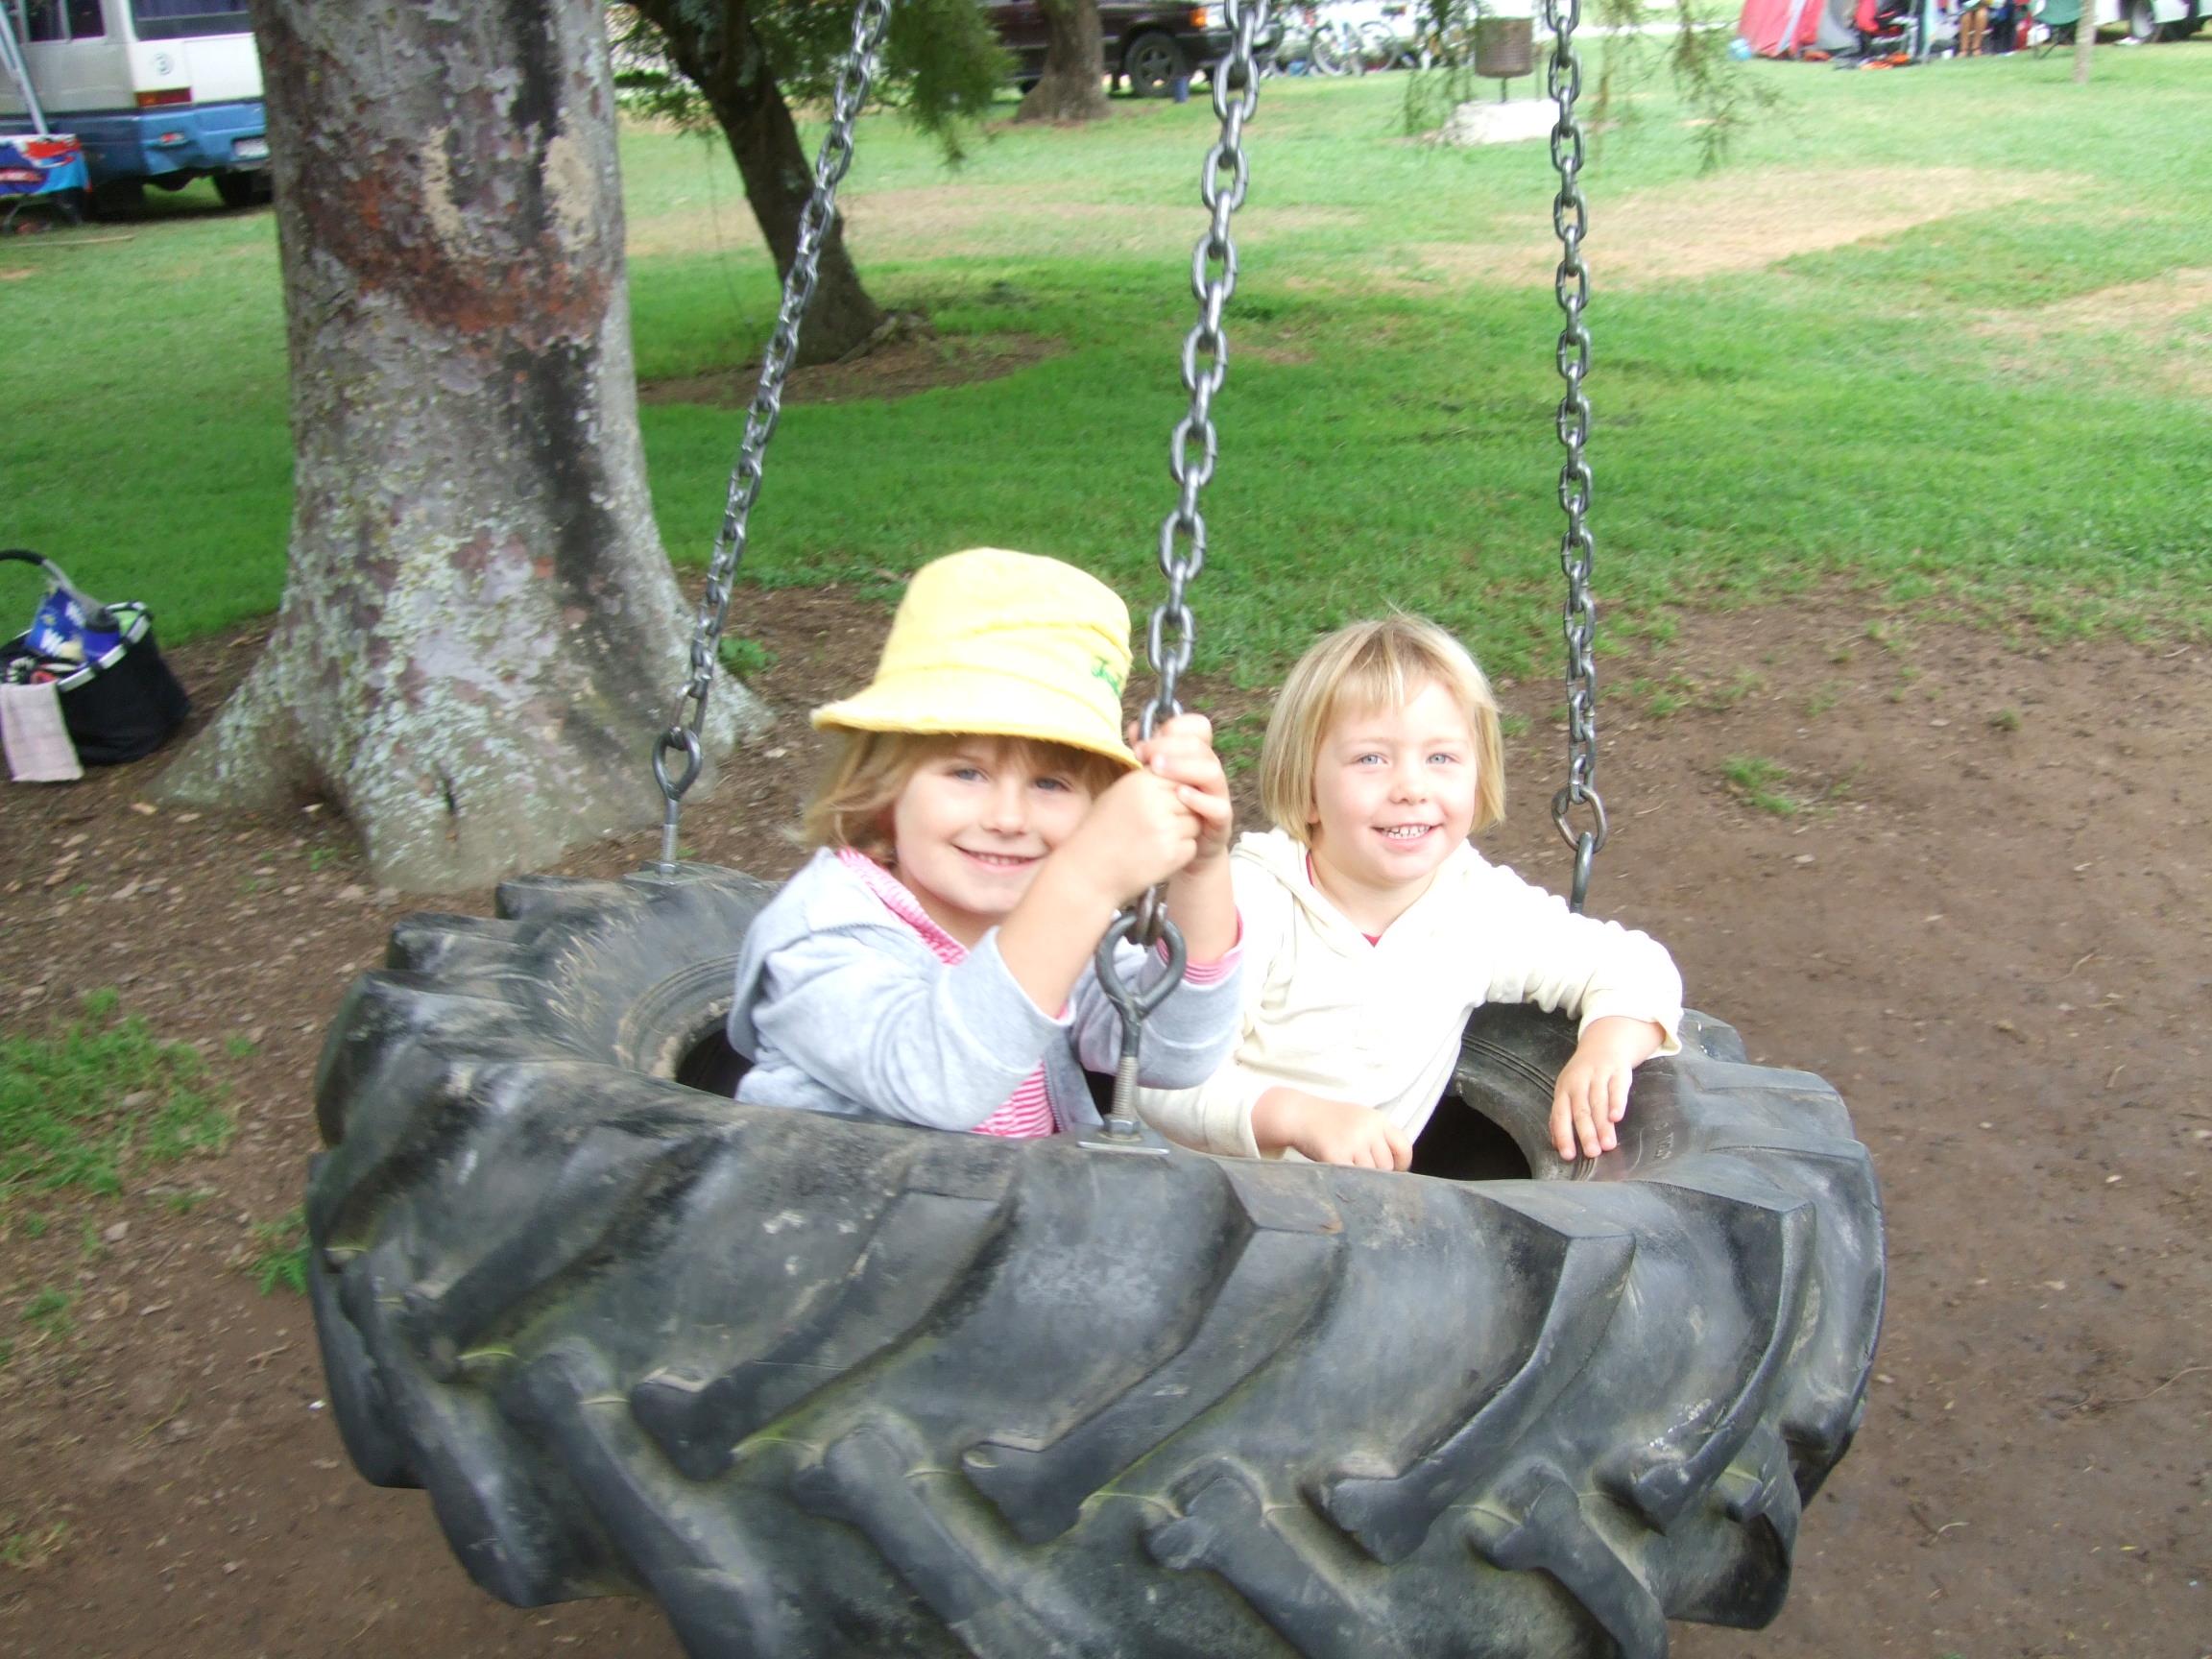 Charlee & Poppy on the tyre swing